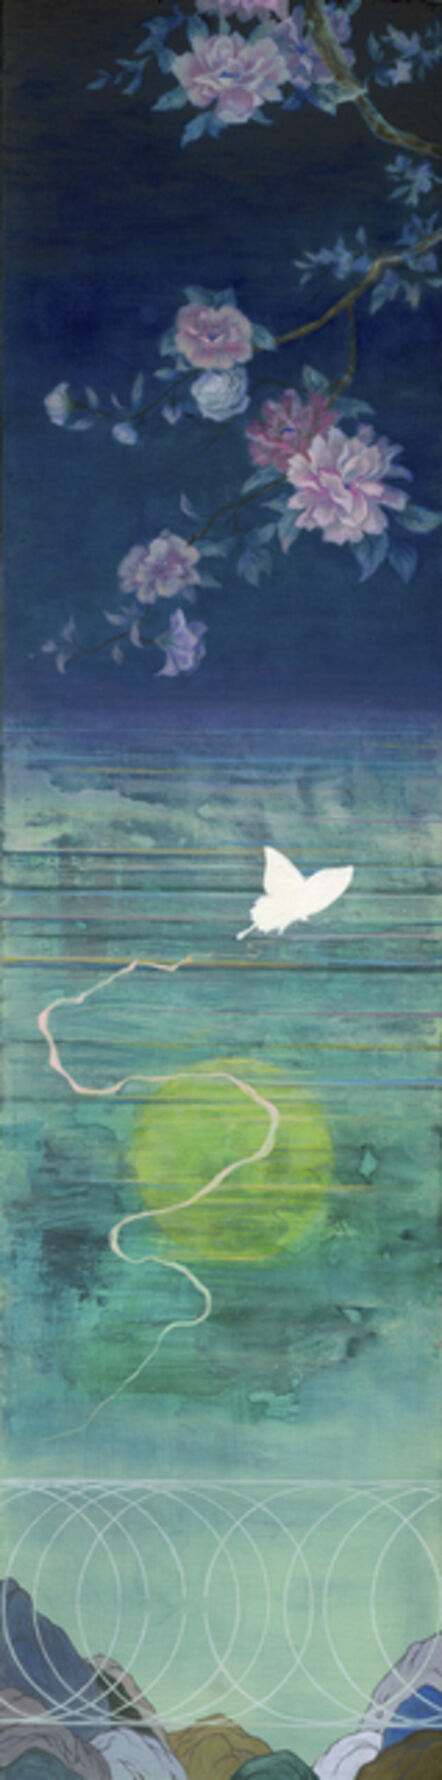 Pei-Cheng Hsu 許旆誠, '水不知月', 2020